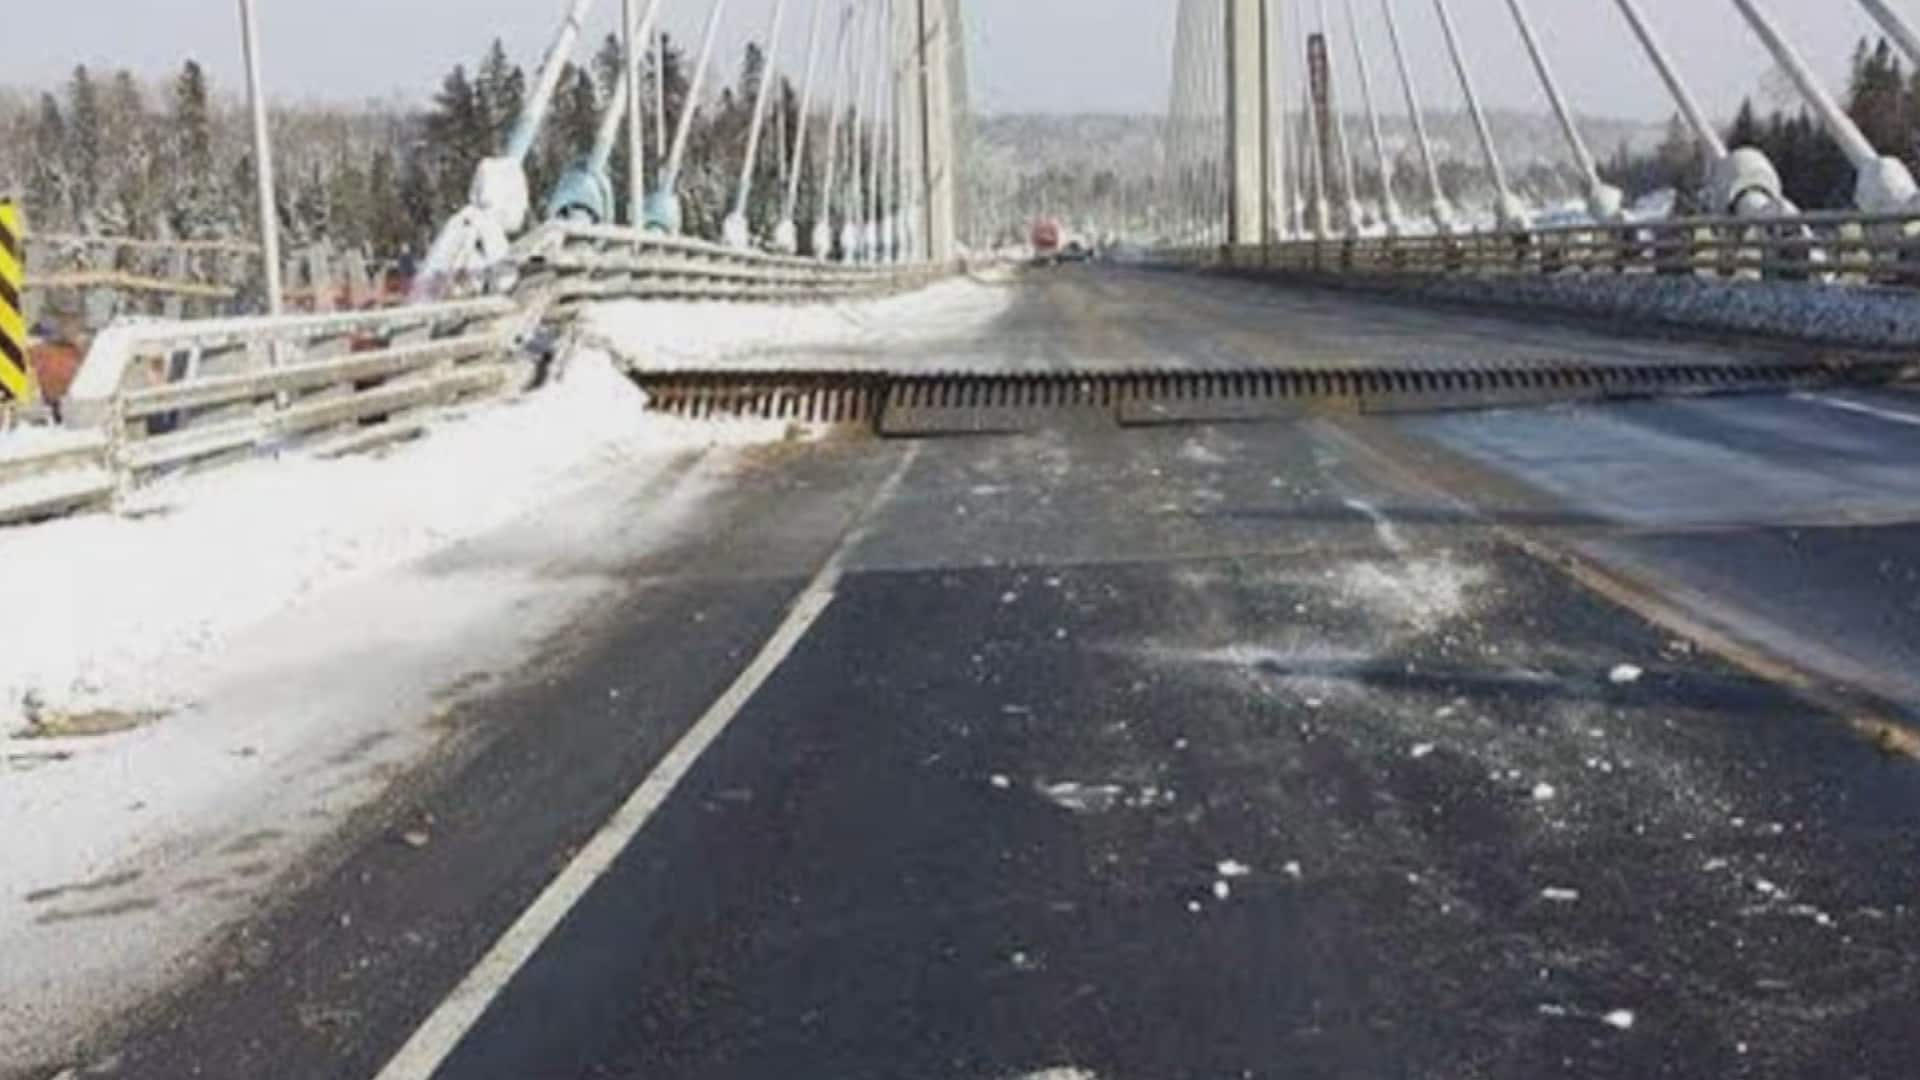 Ontario's Nipigon River bridge fails, severing Trans-Canada Highway